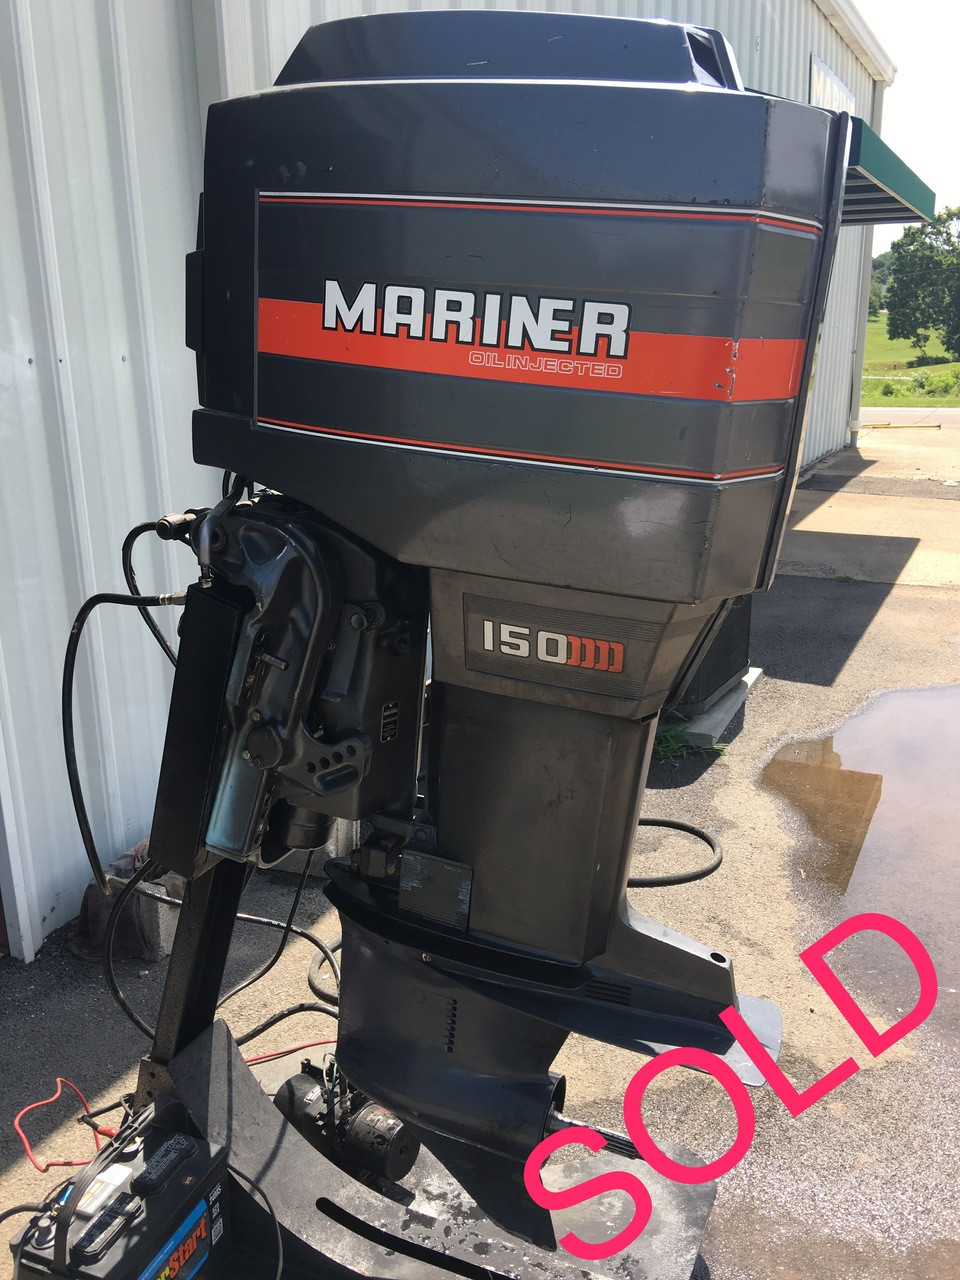 1992 Mariner 150 Hp Outboard Manual Wiring Diagram 2000 Lesabre Injector